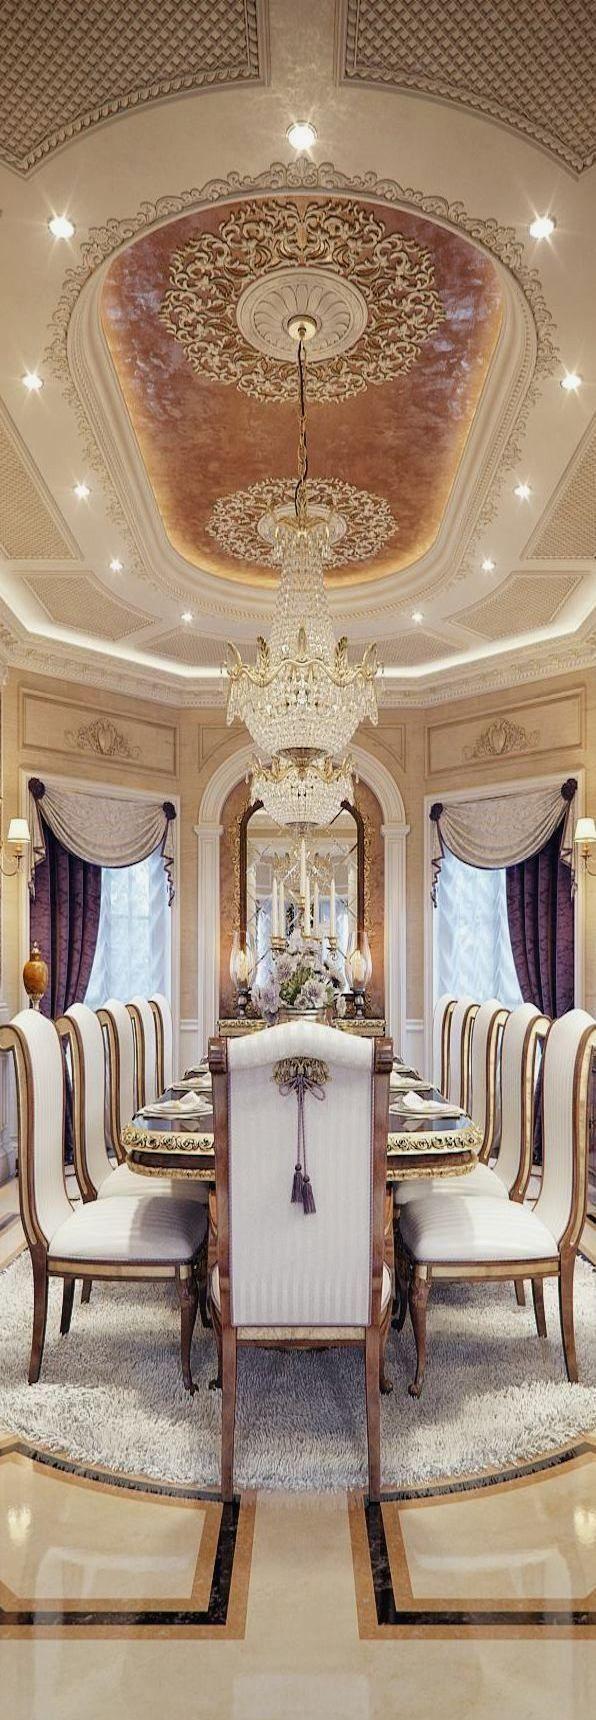 16 beautiful Interior Modern Lighting Designs Beds